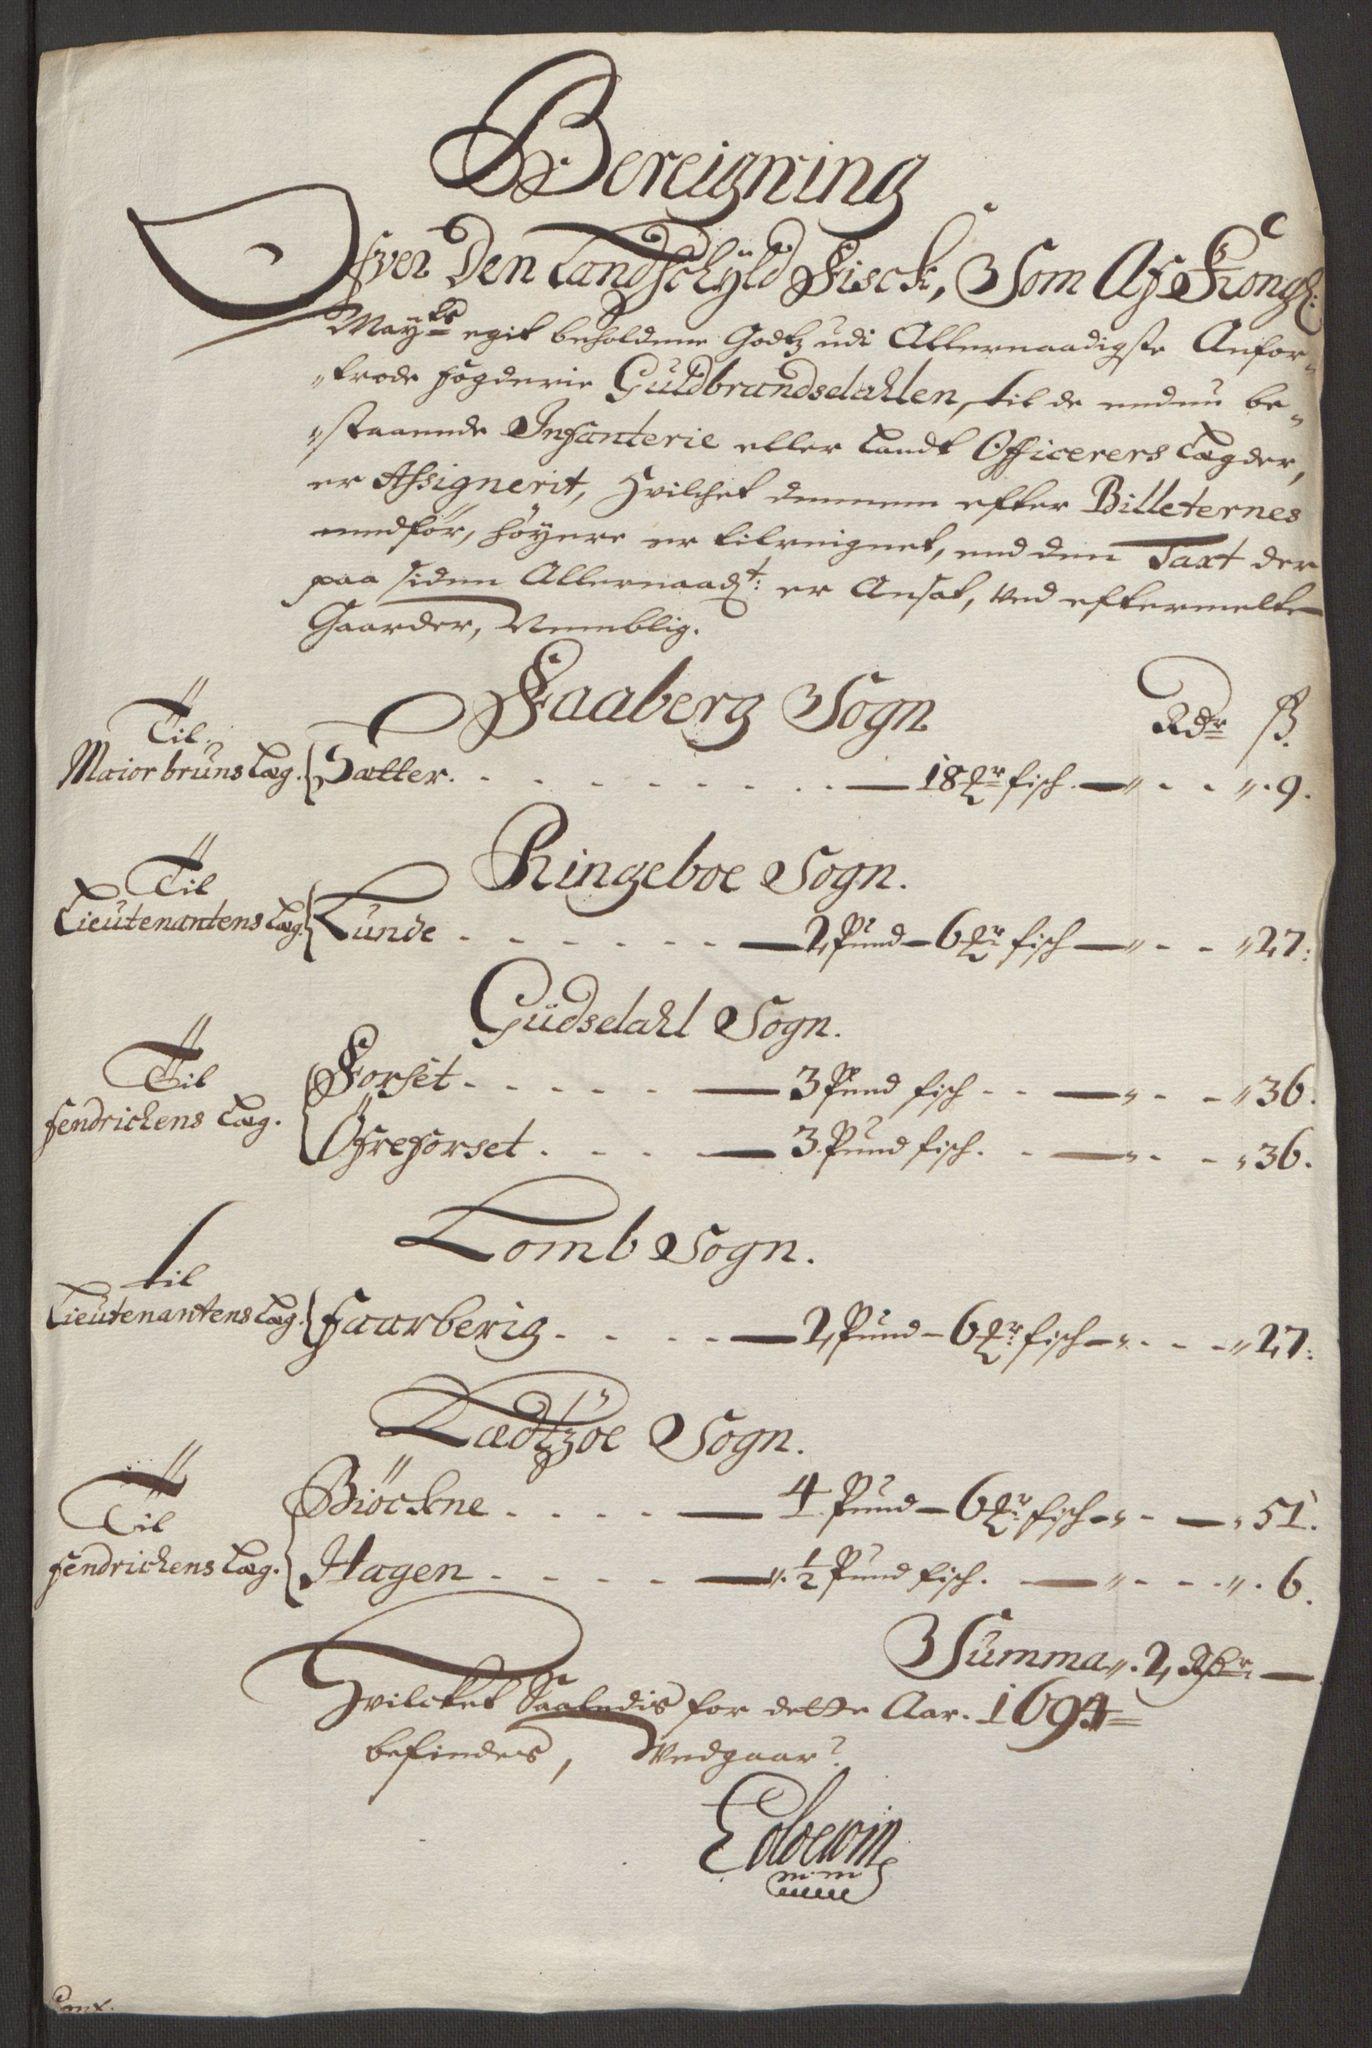 RA, Rentekammeret inntil 1814, Reviderte regnskaper, Fogderegnskap, R17/L1168: Fogderegnskap Gudbrandsdal, 1694, s. 305